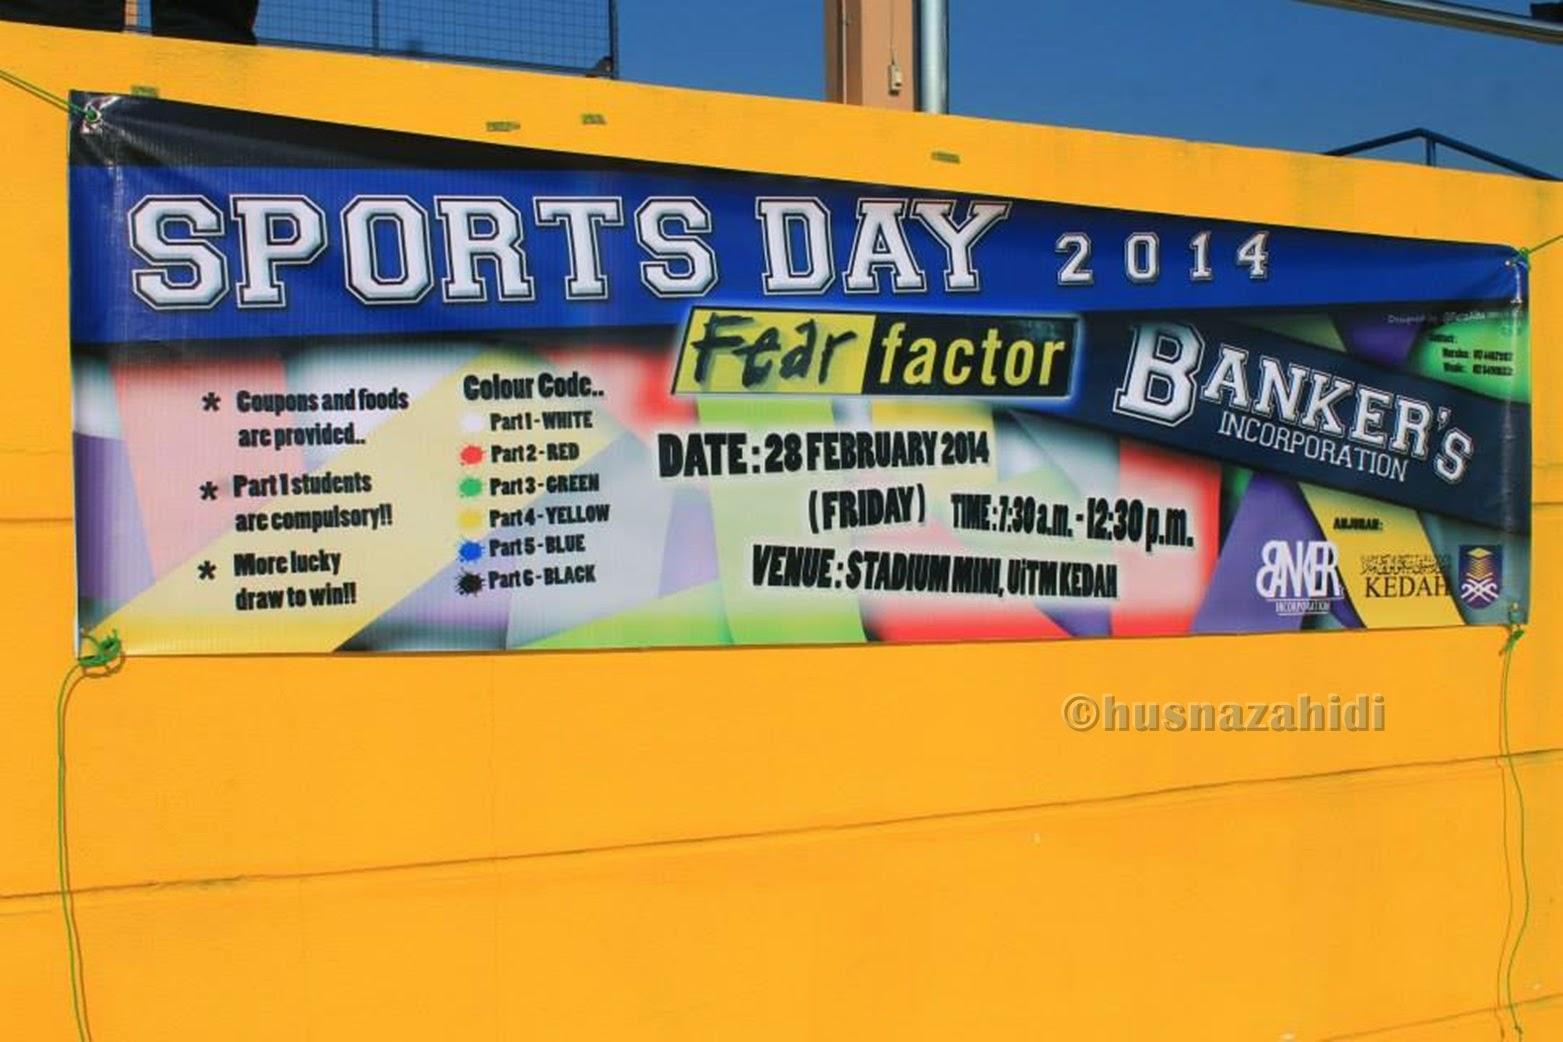 sport day banner, kelab banker, uitm kedah